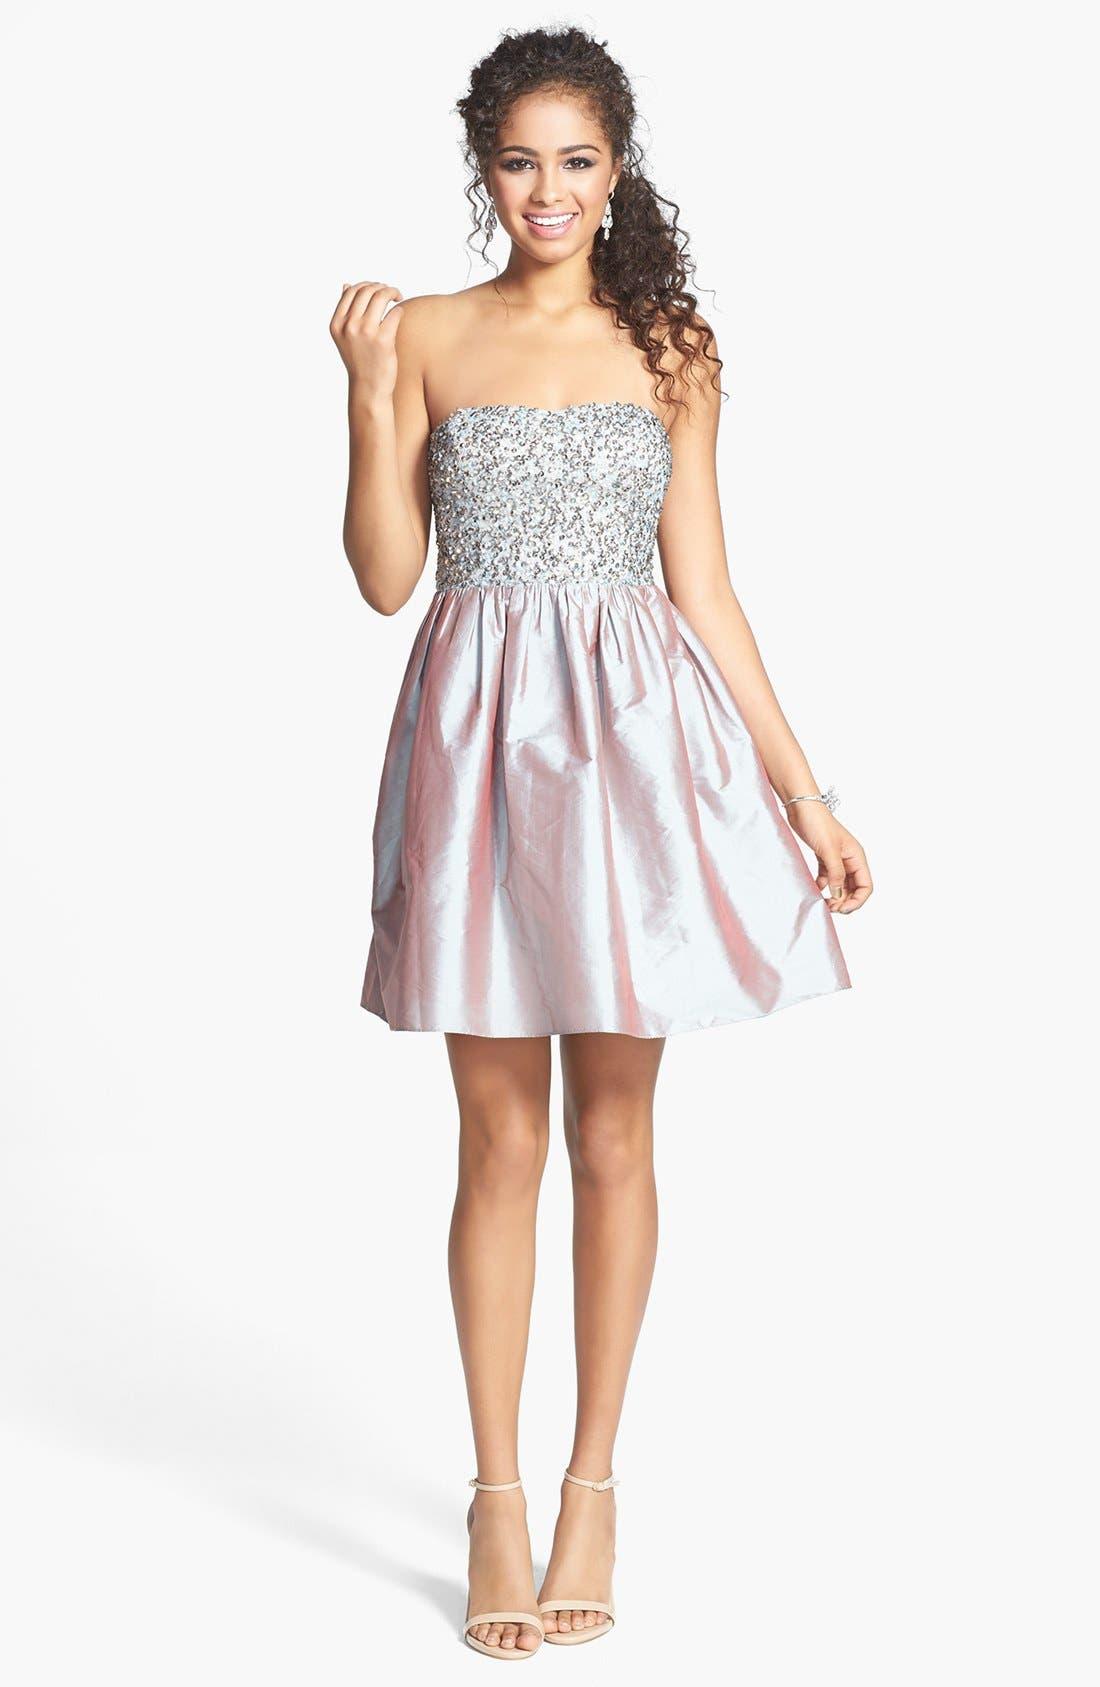 Alternate Image 1 Selected - Adrianna Papell Embellished Bodice Strapless Taffeta Dress